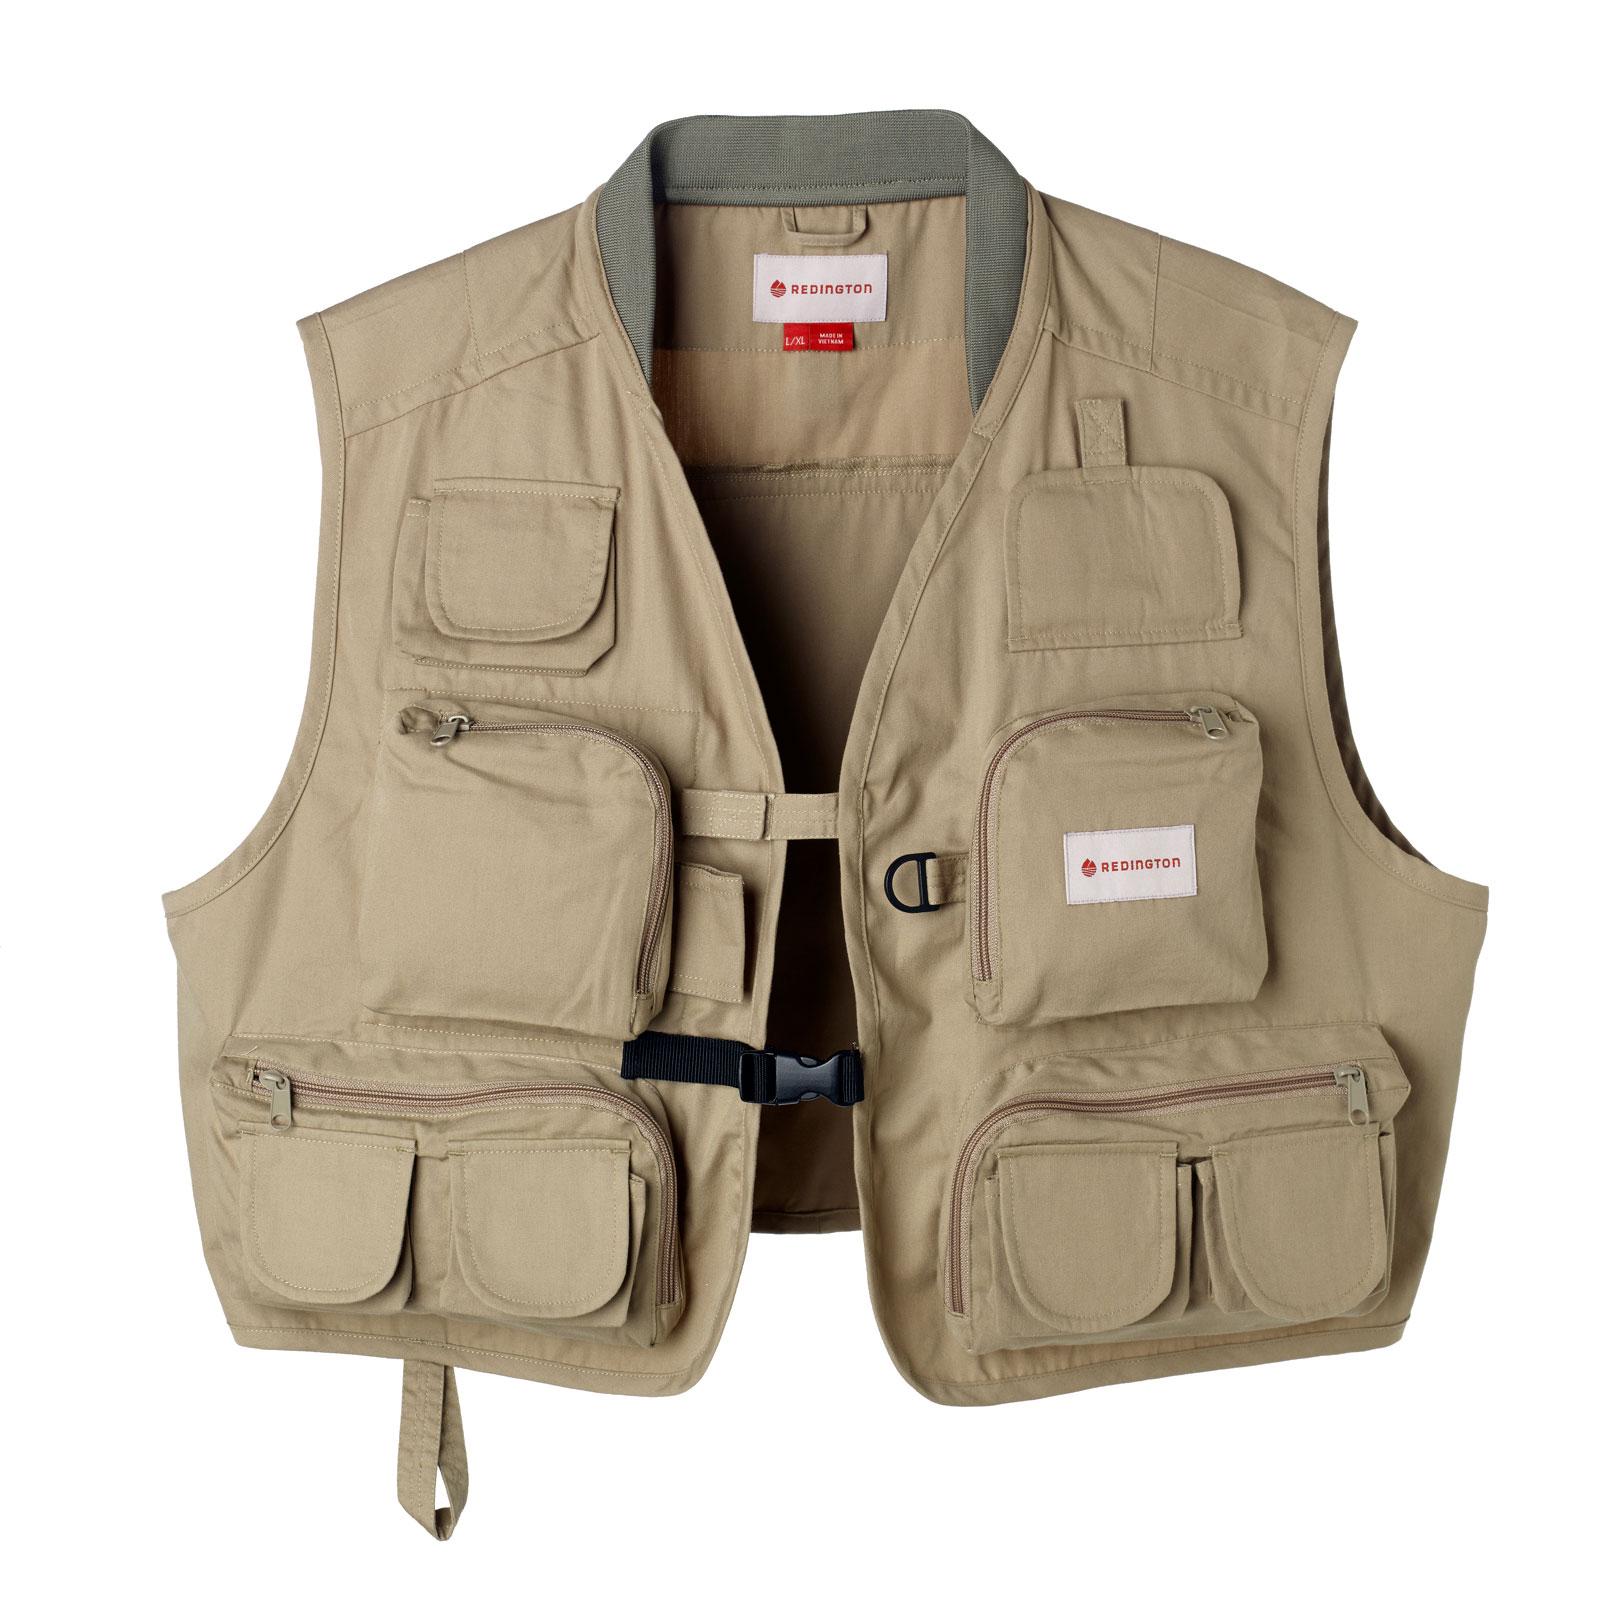 Redington Blackfoot River Fly Fishing Vest Durable Fast Wicking Quick Dry | eBay